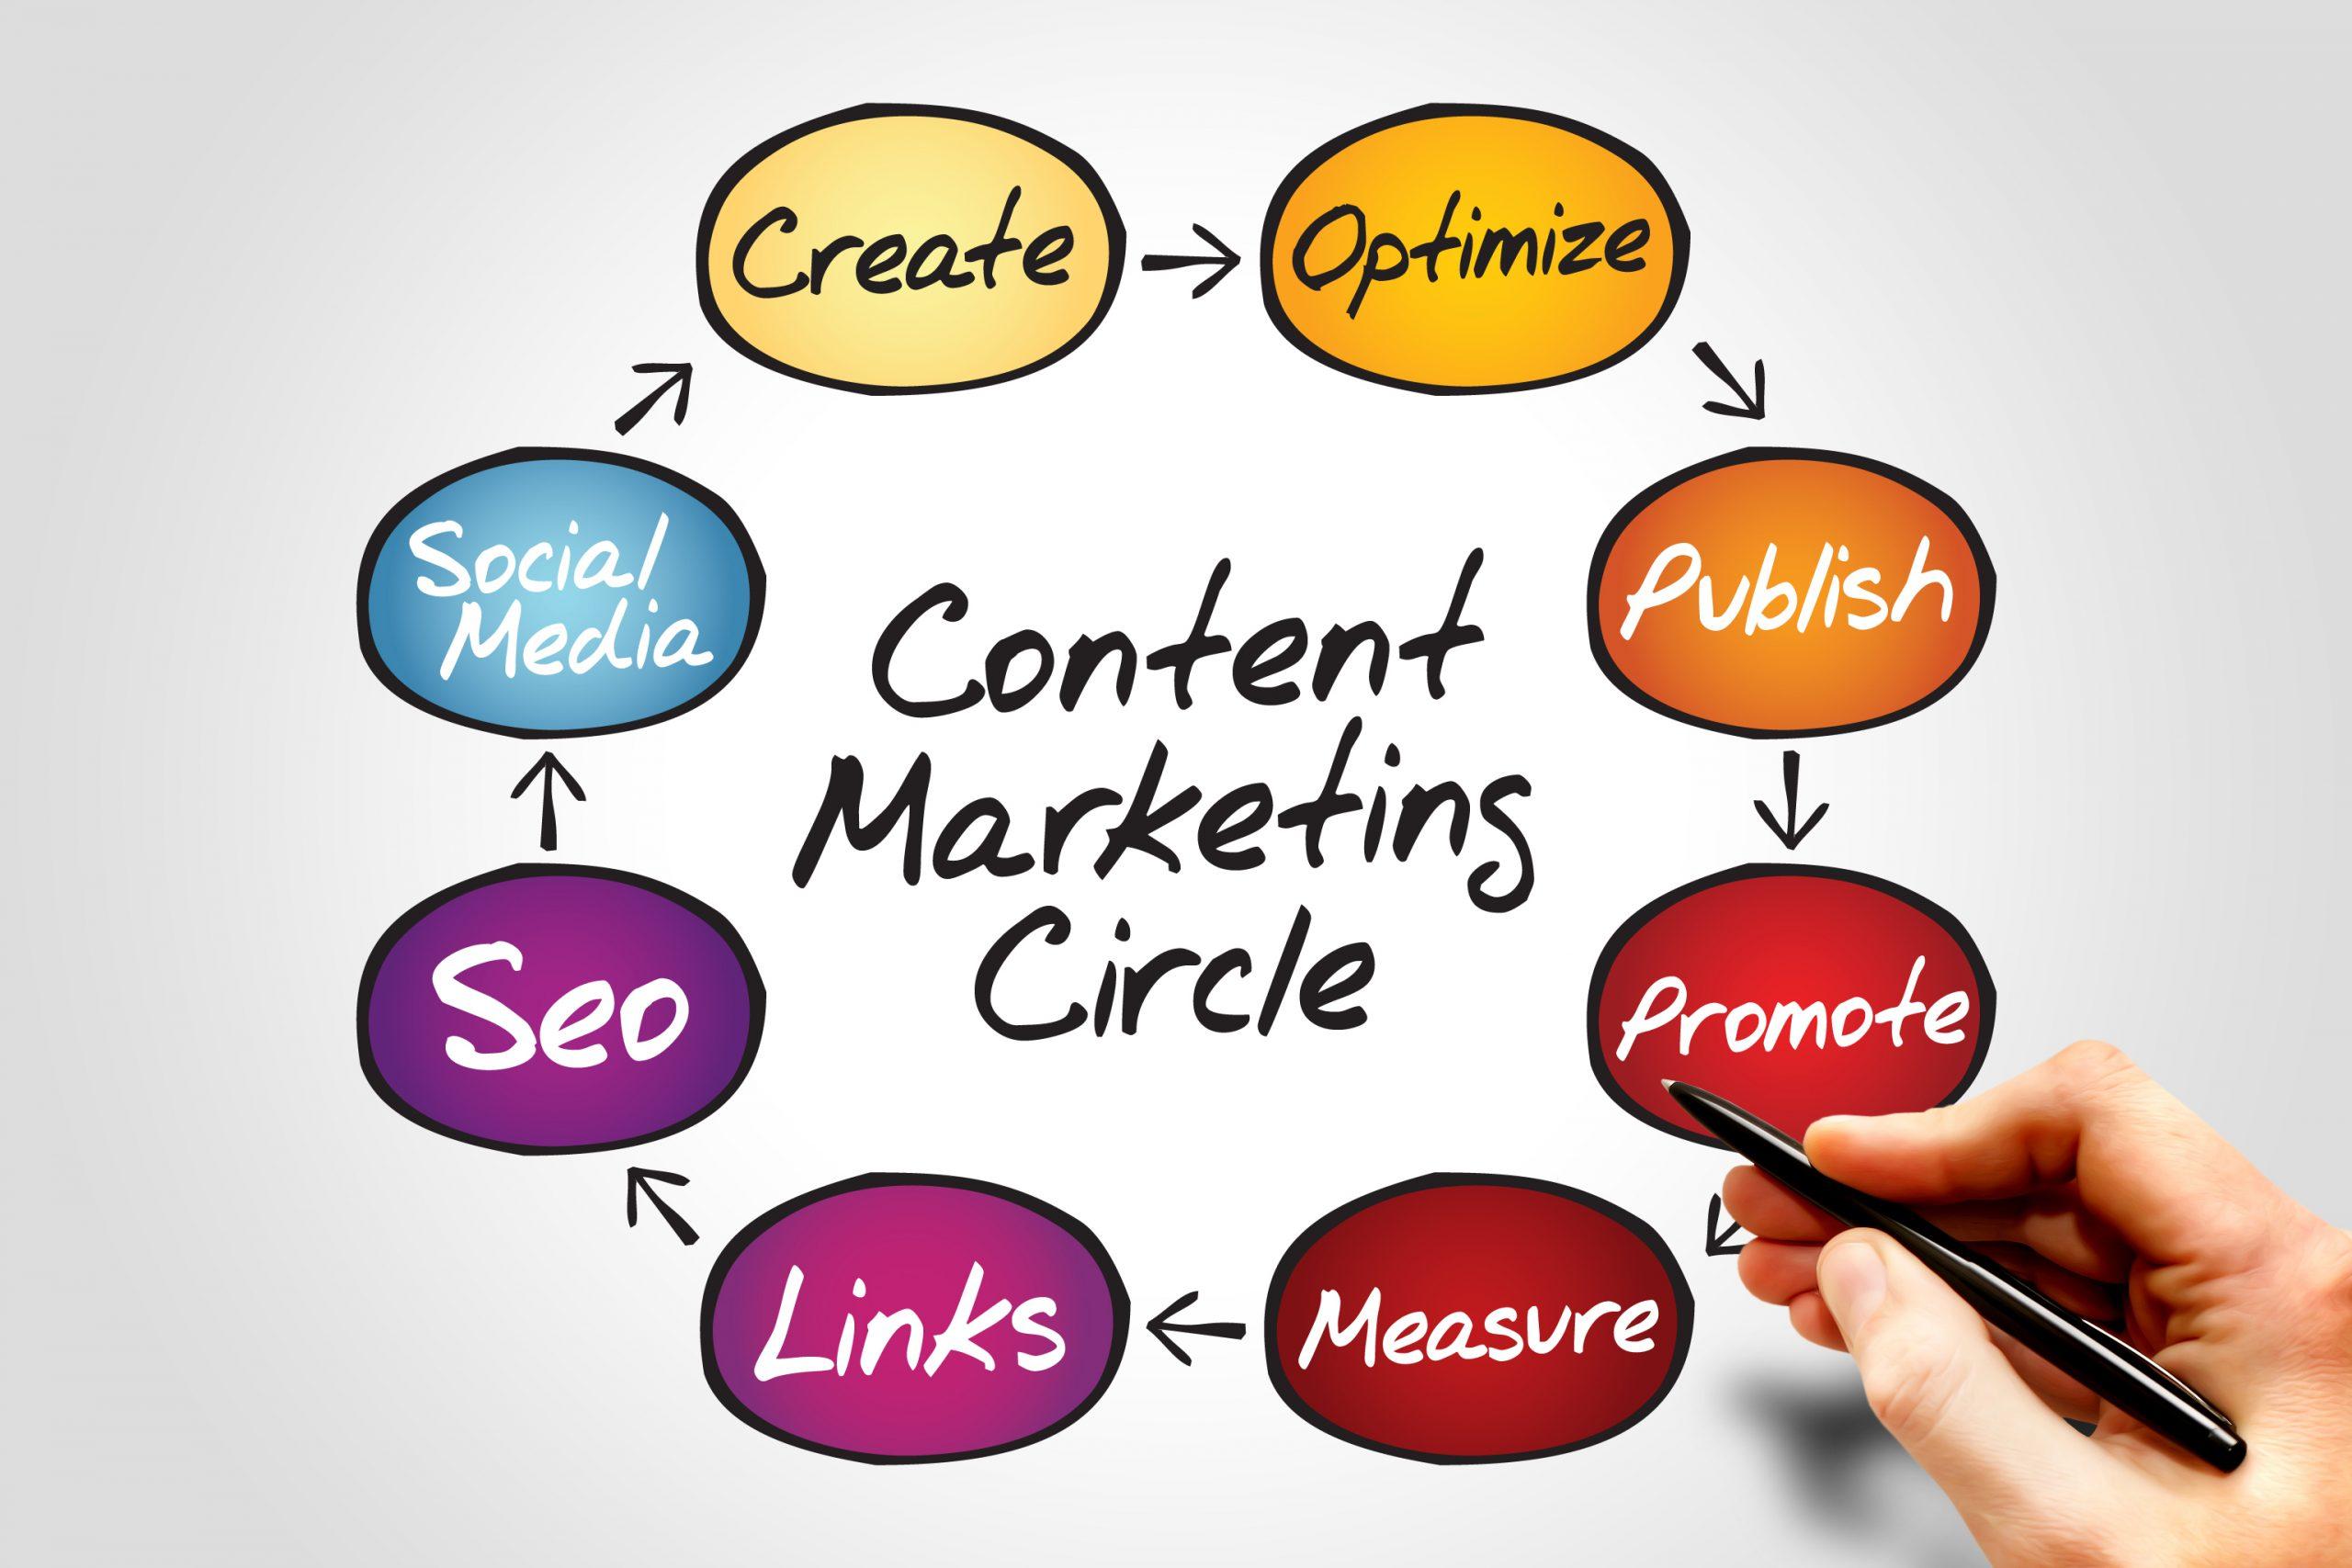 hiểu lầm về content marketing